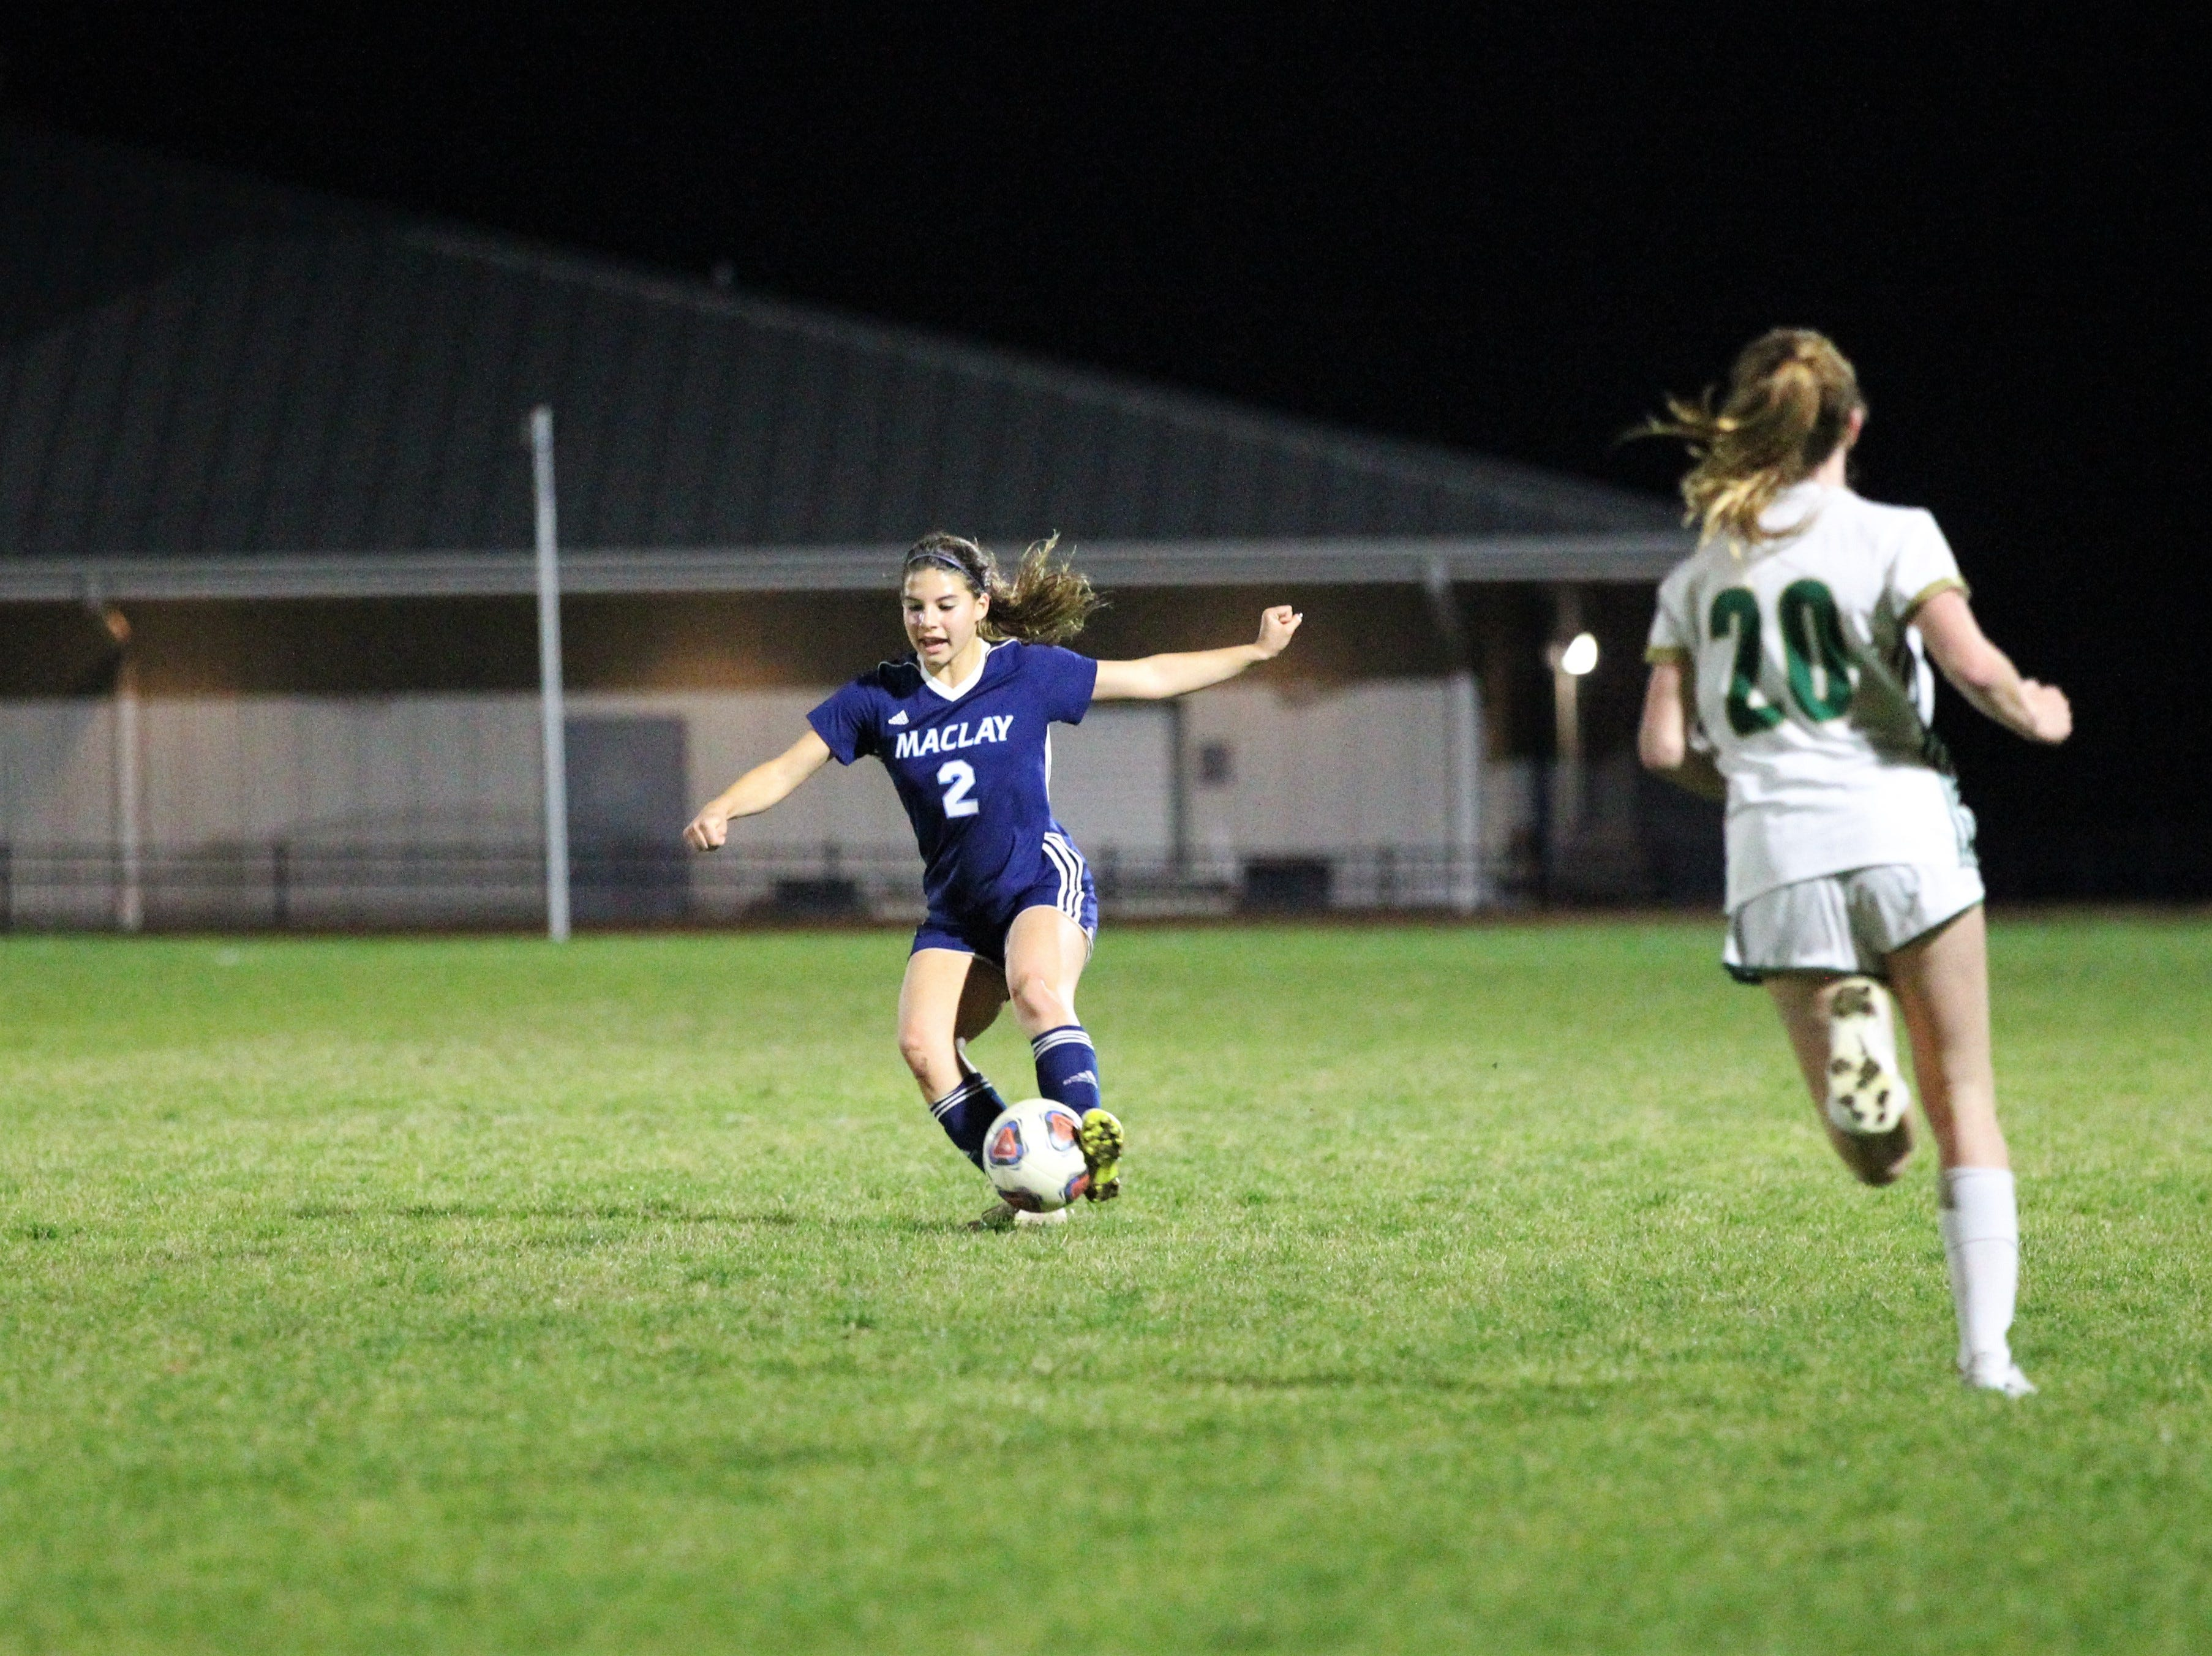 Maclay's Nicole Macri sends a left-footed pass as Maclay's girls soccer team beat St. Joseph Academy 4-0 in a Region 1-1A quarterfinal on Jan. 5, 2019.